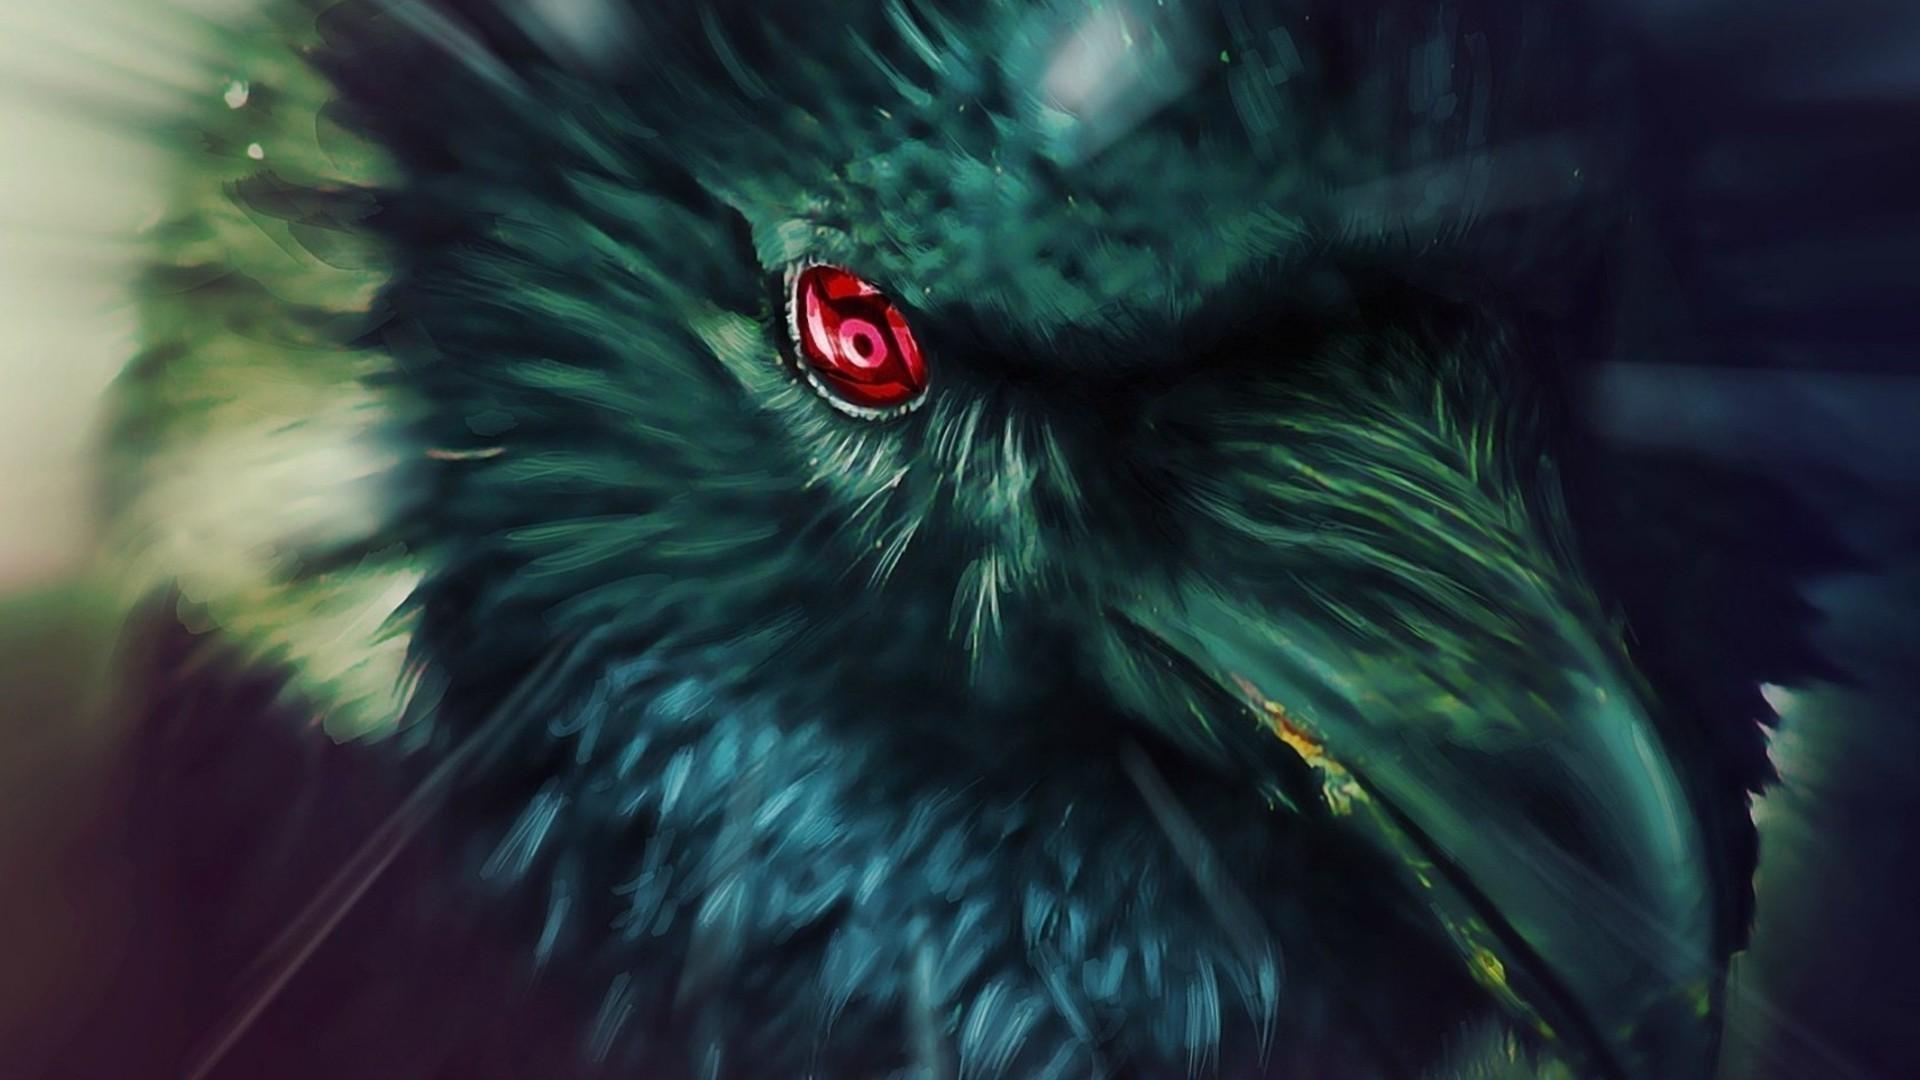 Itachi's Crow – Naruto wallpaper – 1023679